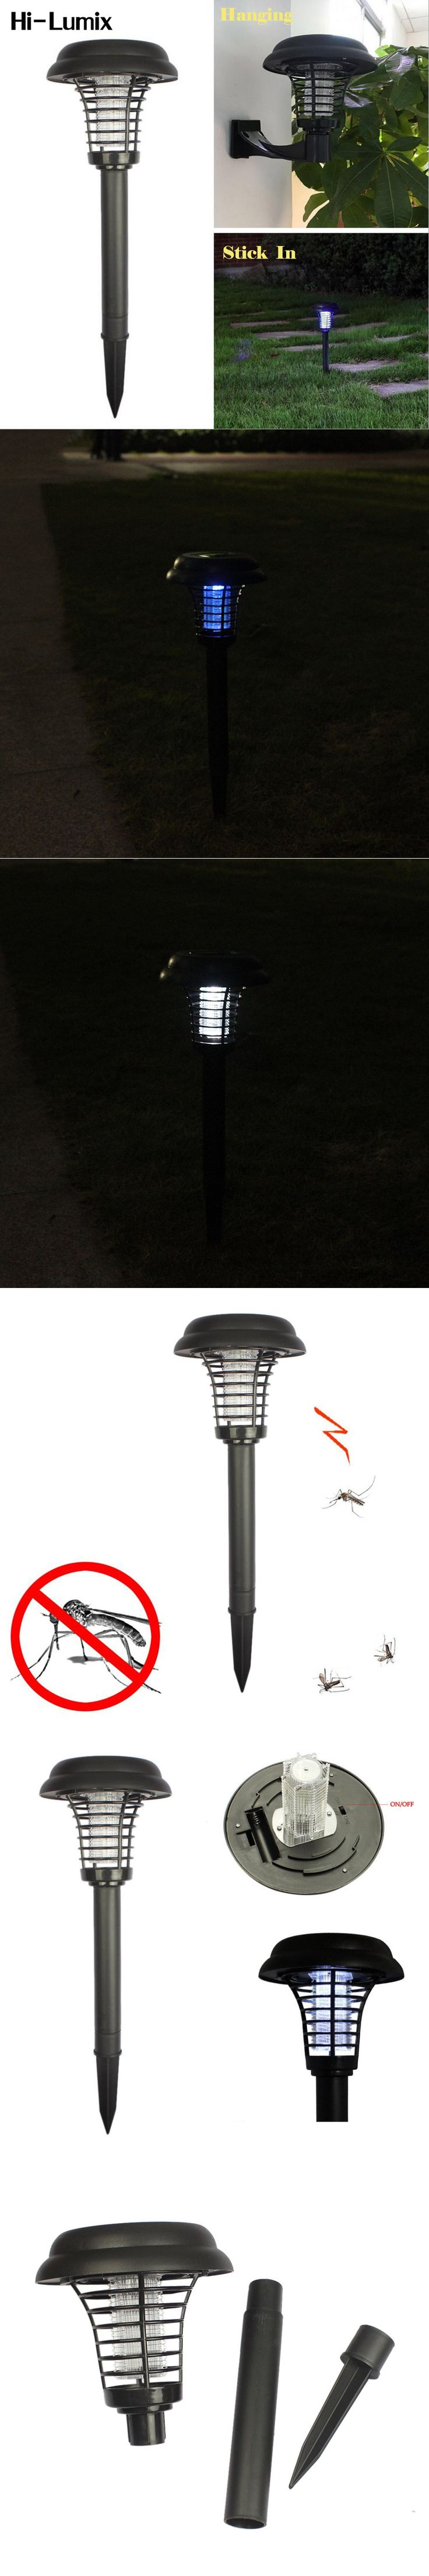 Hi-Lumix LED Solar Powered Lamp Garden Bug Zappers Lights Electronic Anti-Mosquito Lawn Light White UV Purple 3 mode